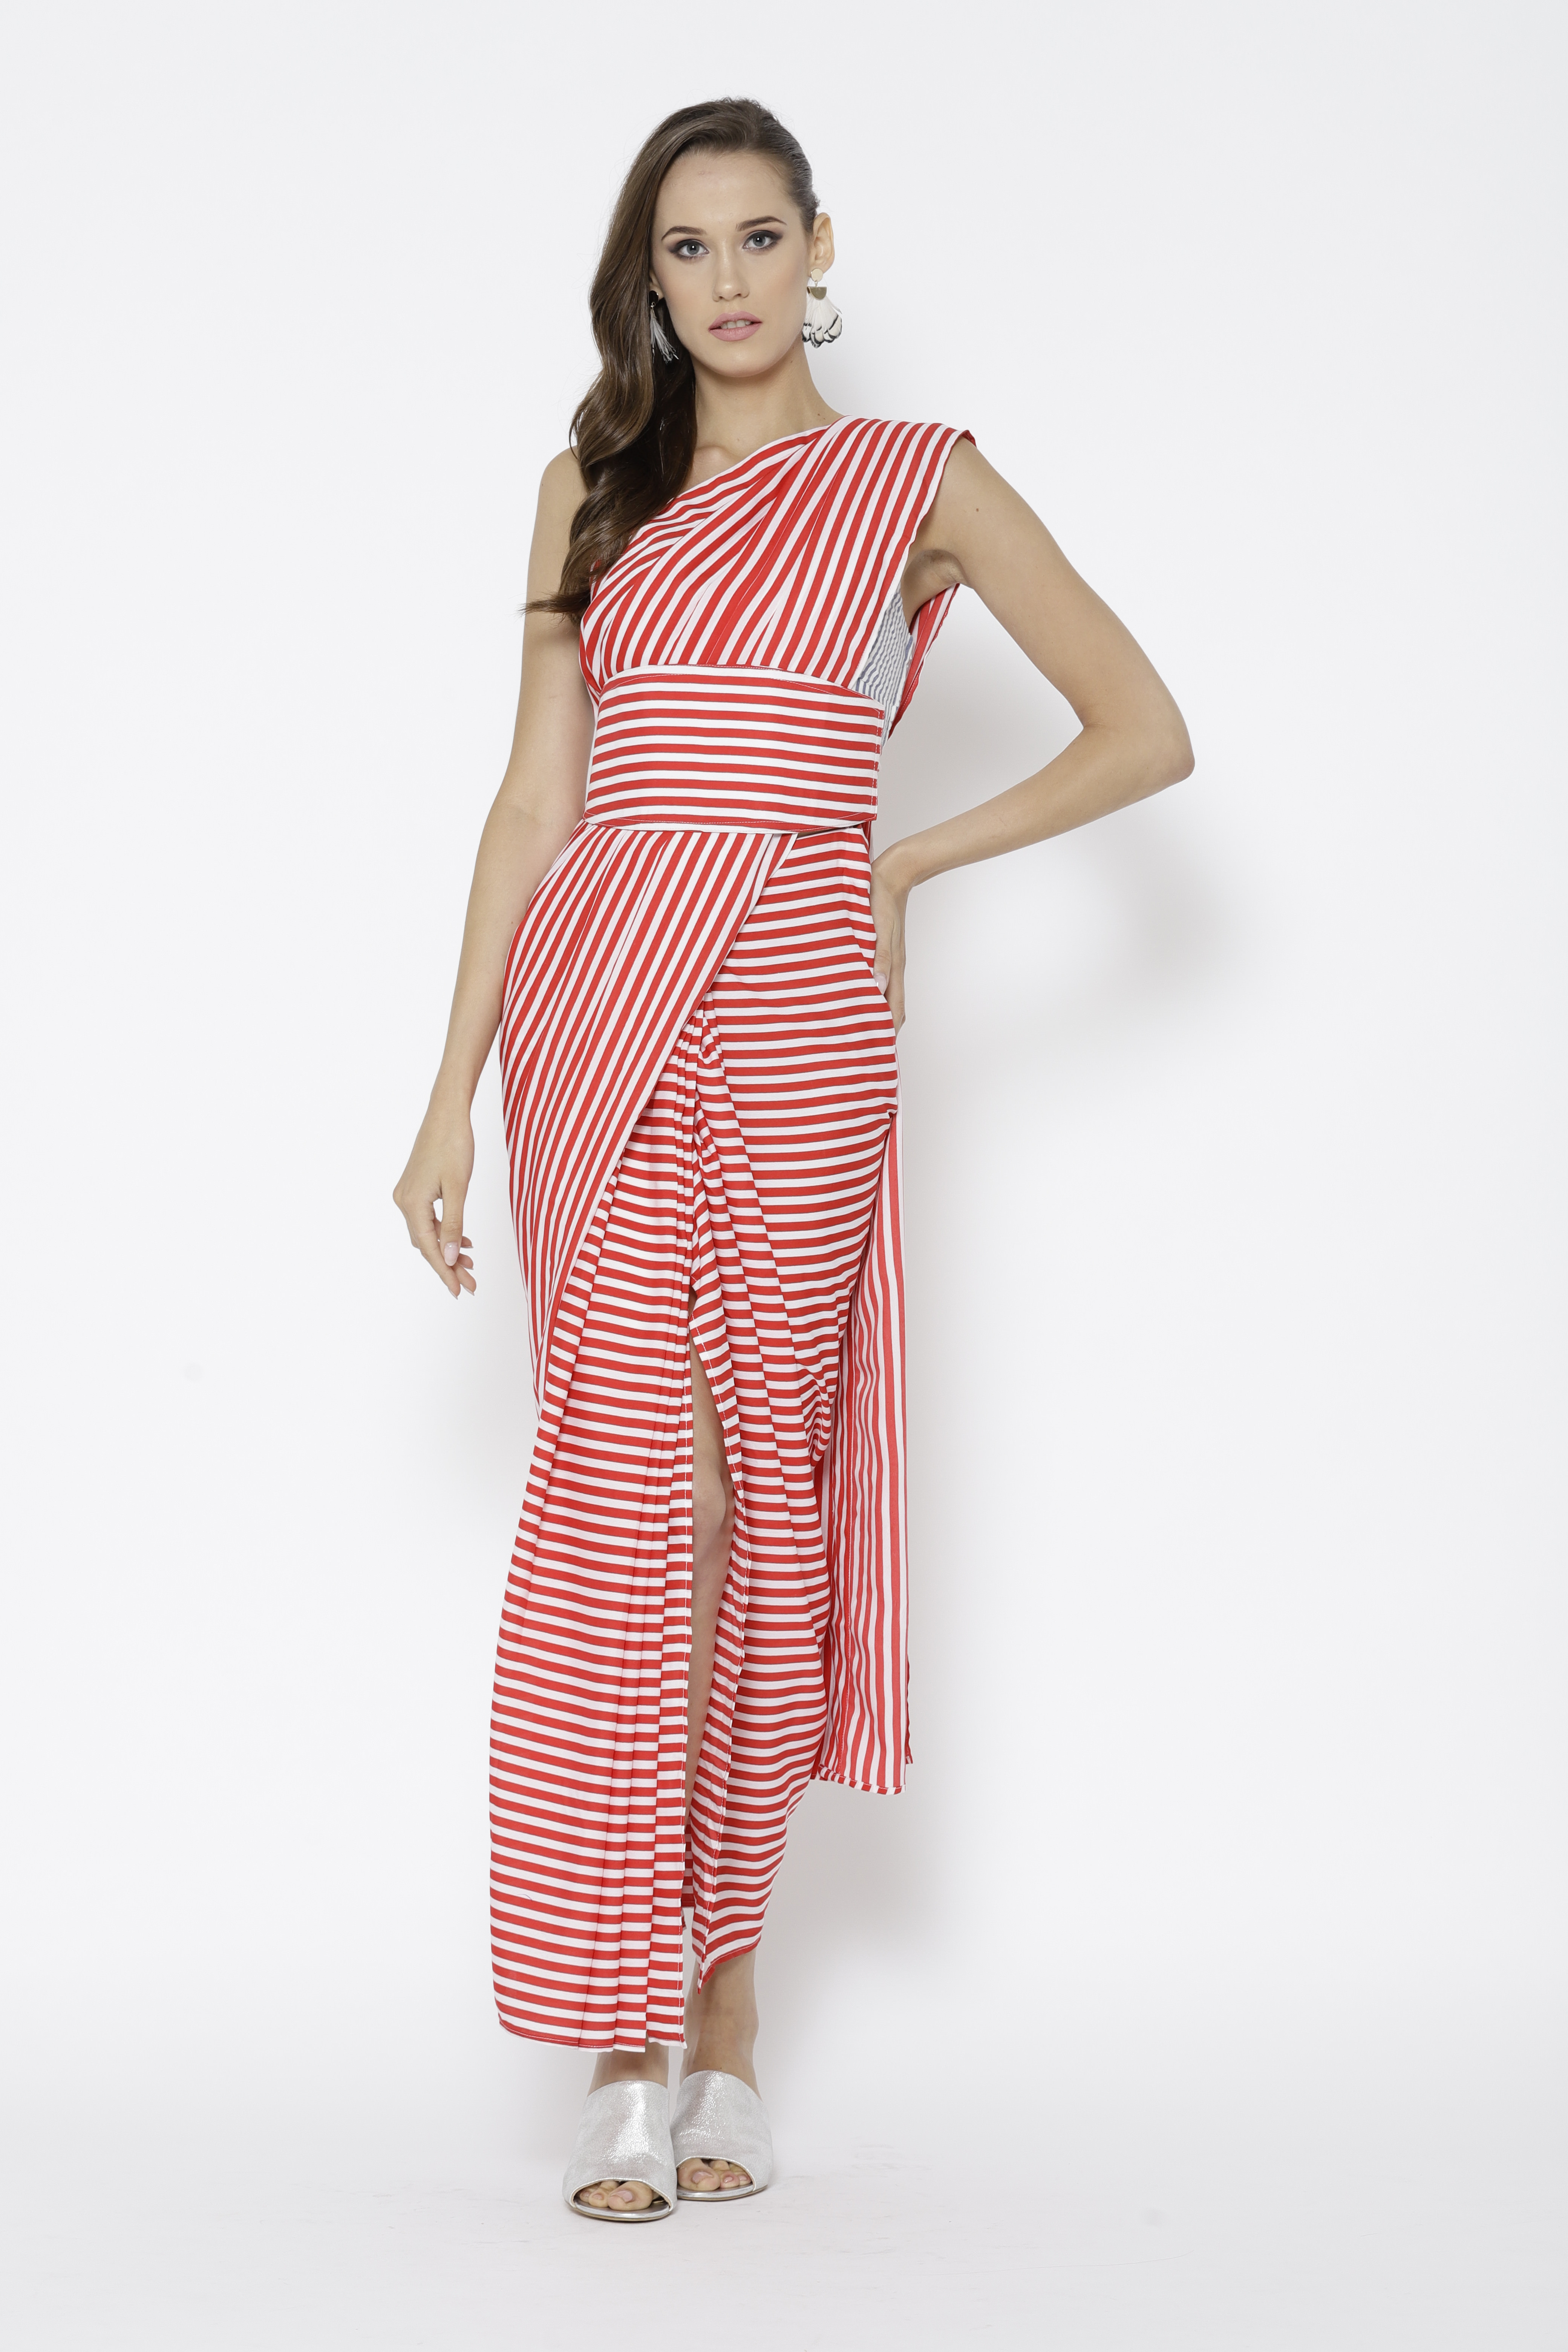 479ad18fcf Stylish Gowns Online India   Huston Fislar Photography